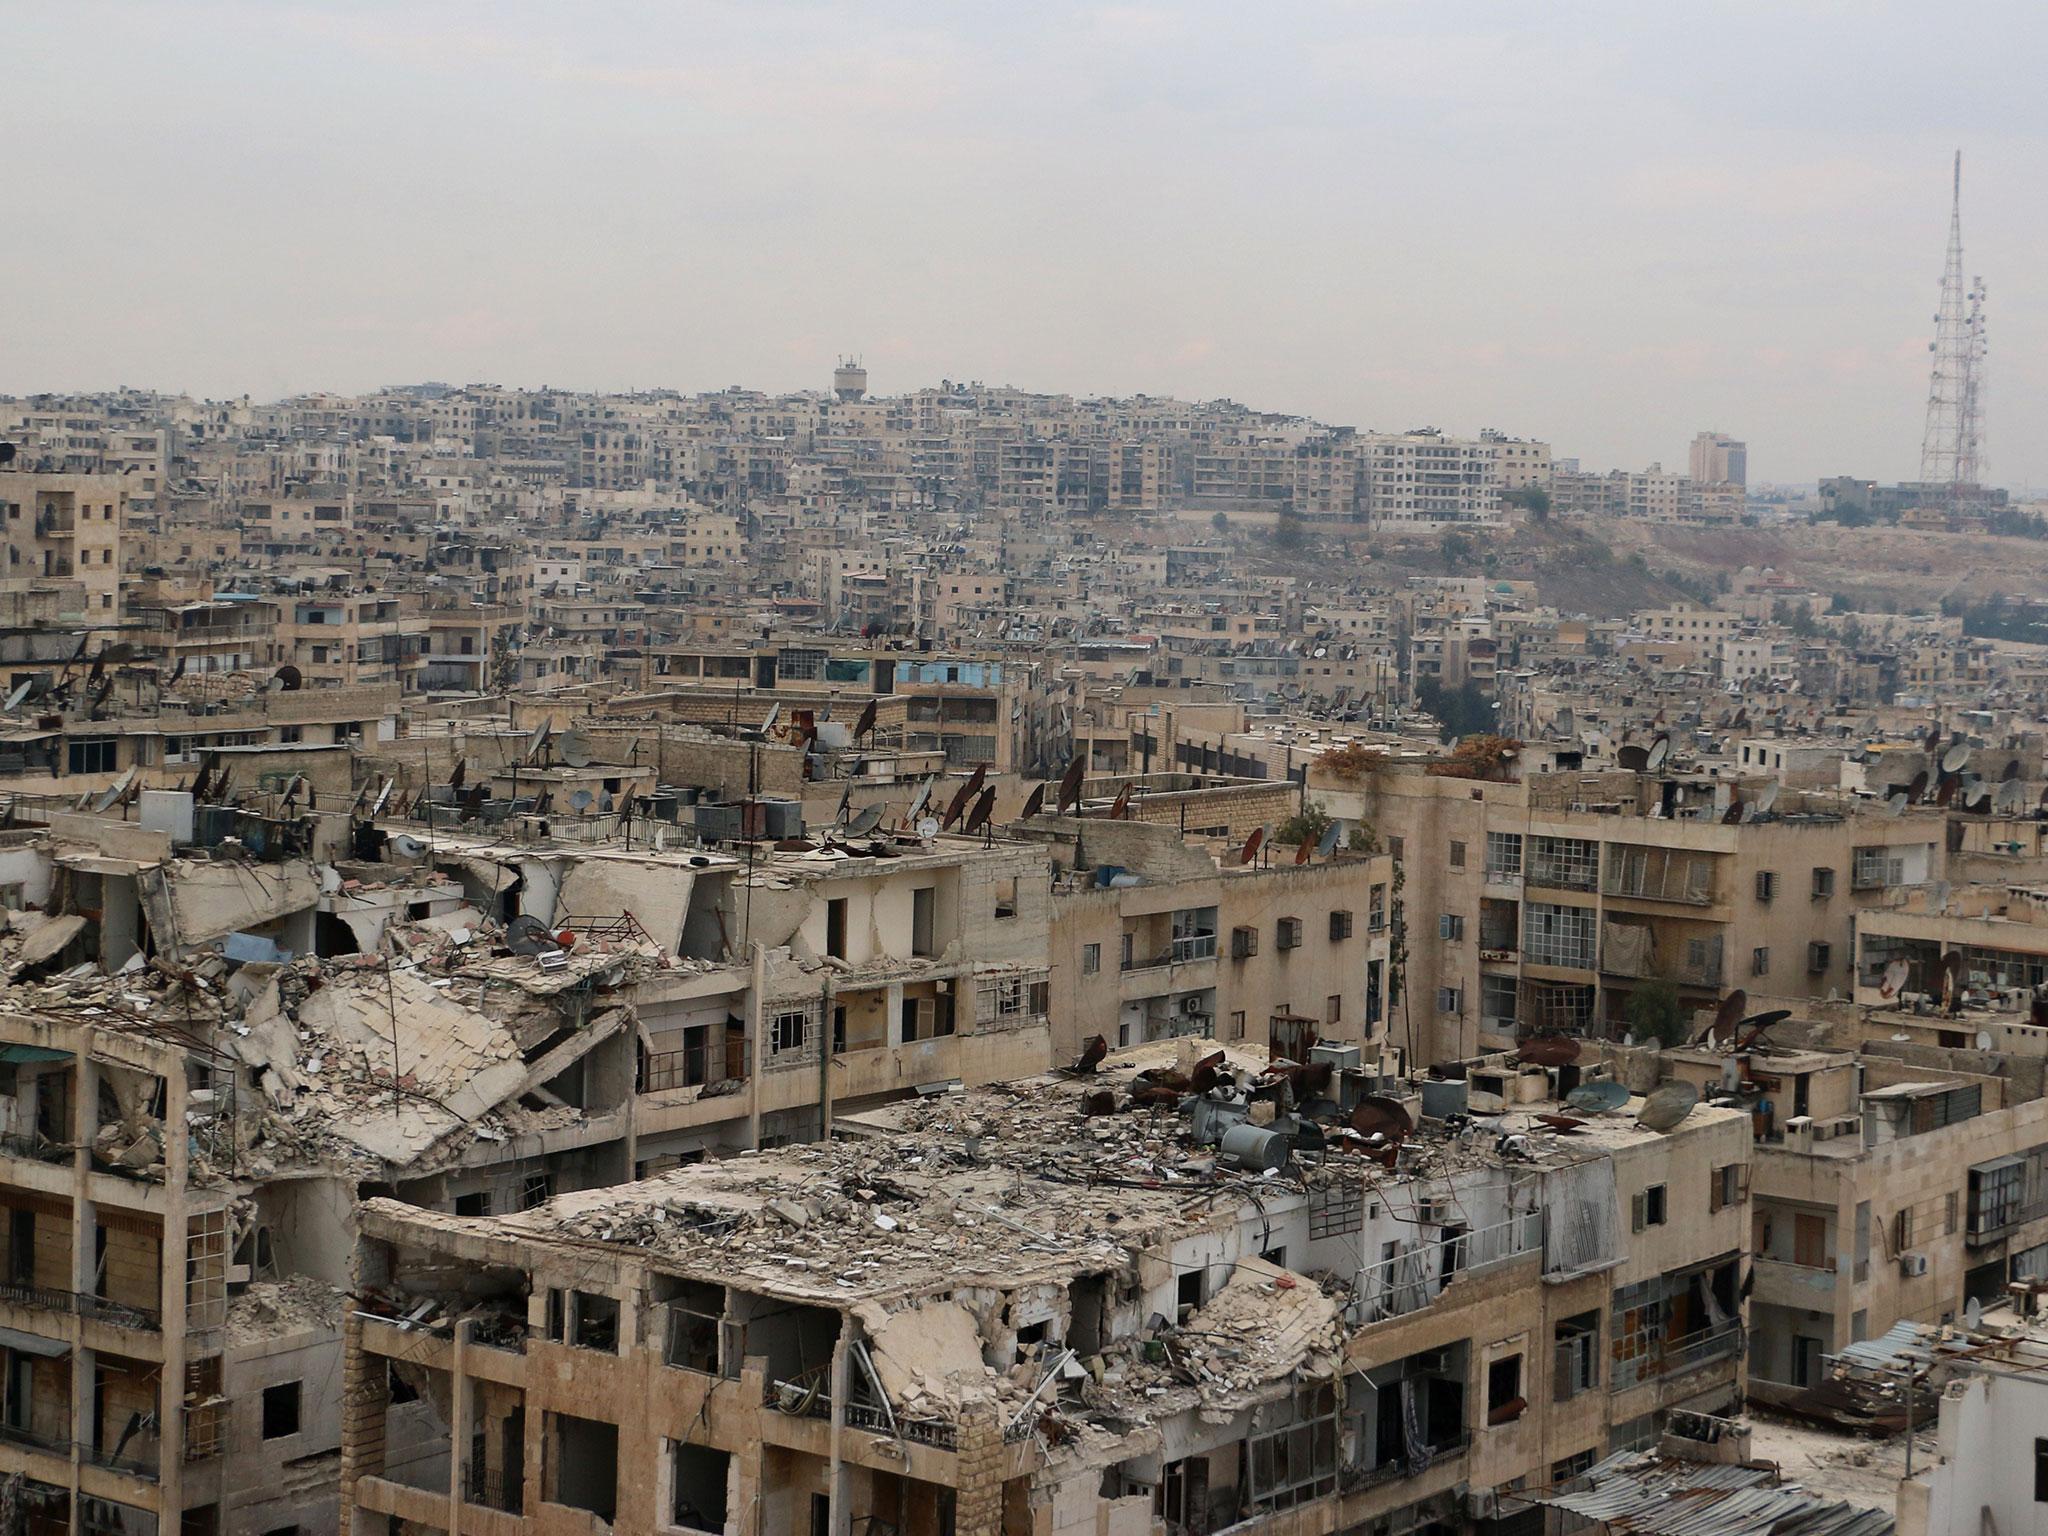 Режим Асада отказался отмирного плана ООН поАлеппо